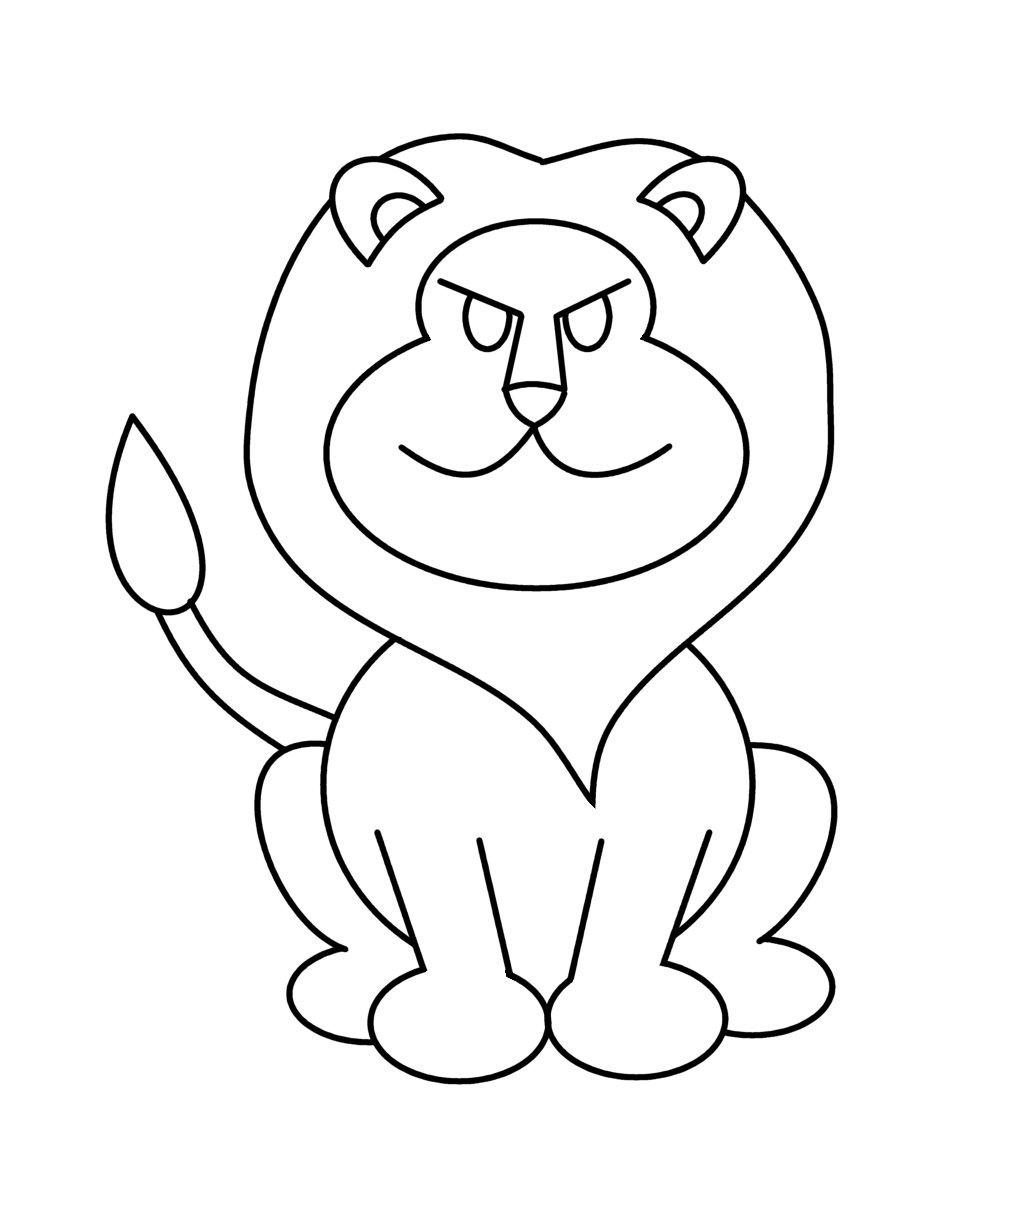 1026x1206 How To Draw Cartoons 2010